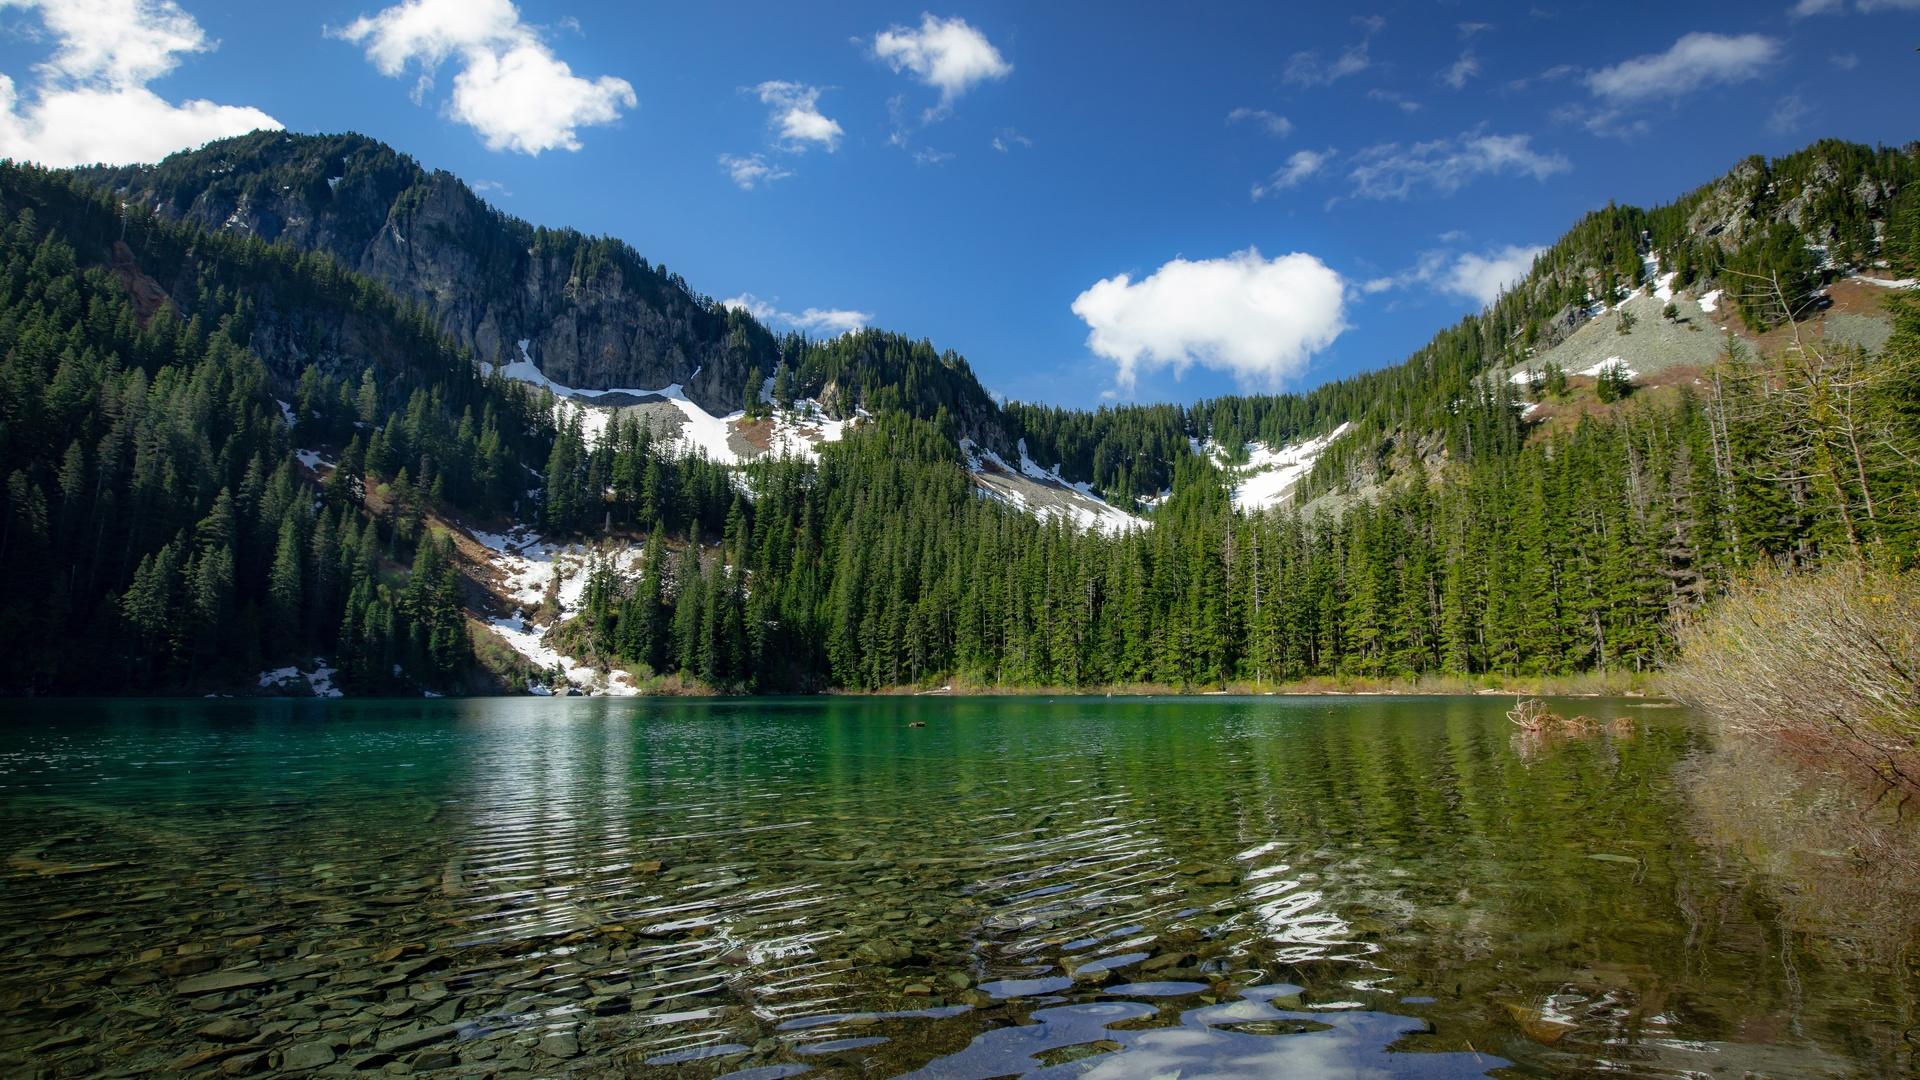 горы, лес, озеро